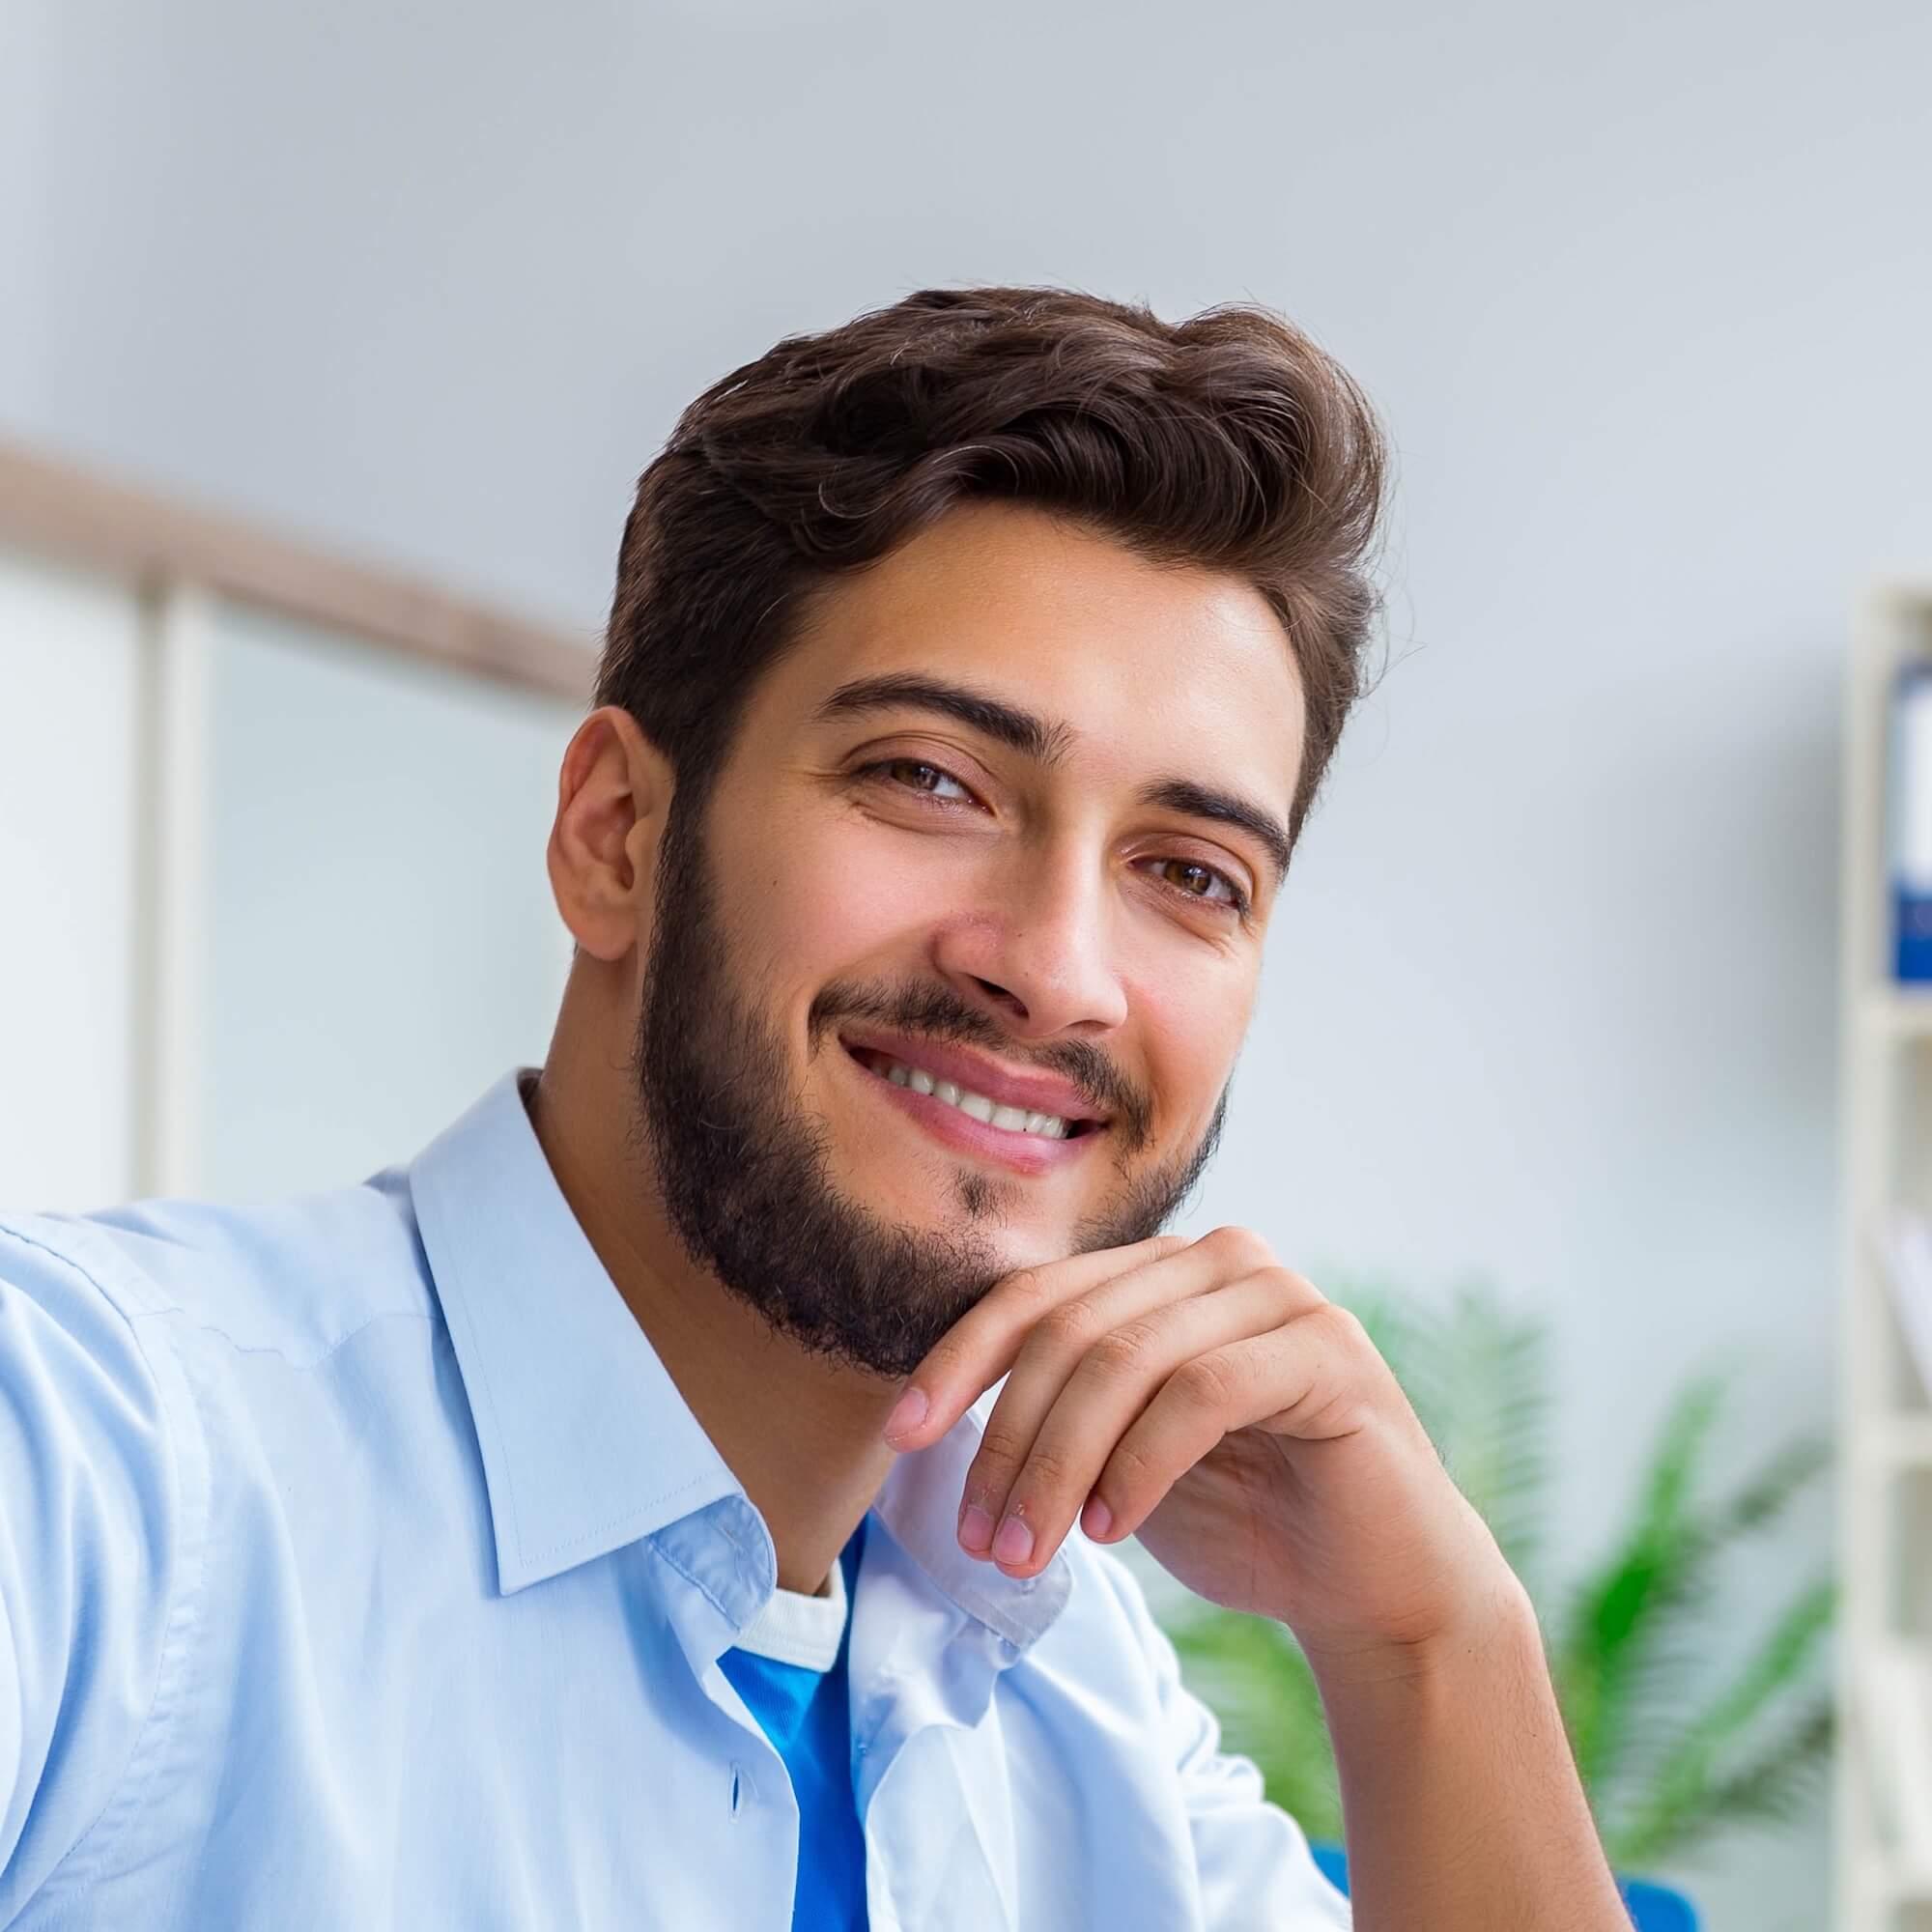 real-estate-exam-tutor-review1